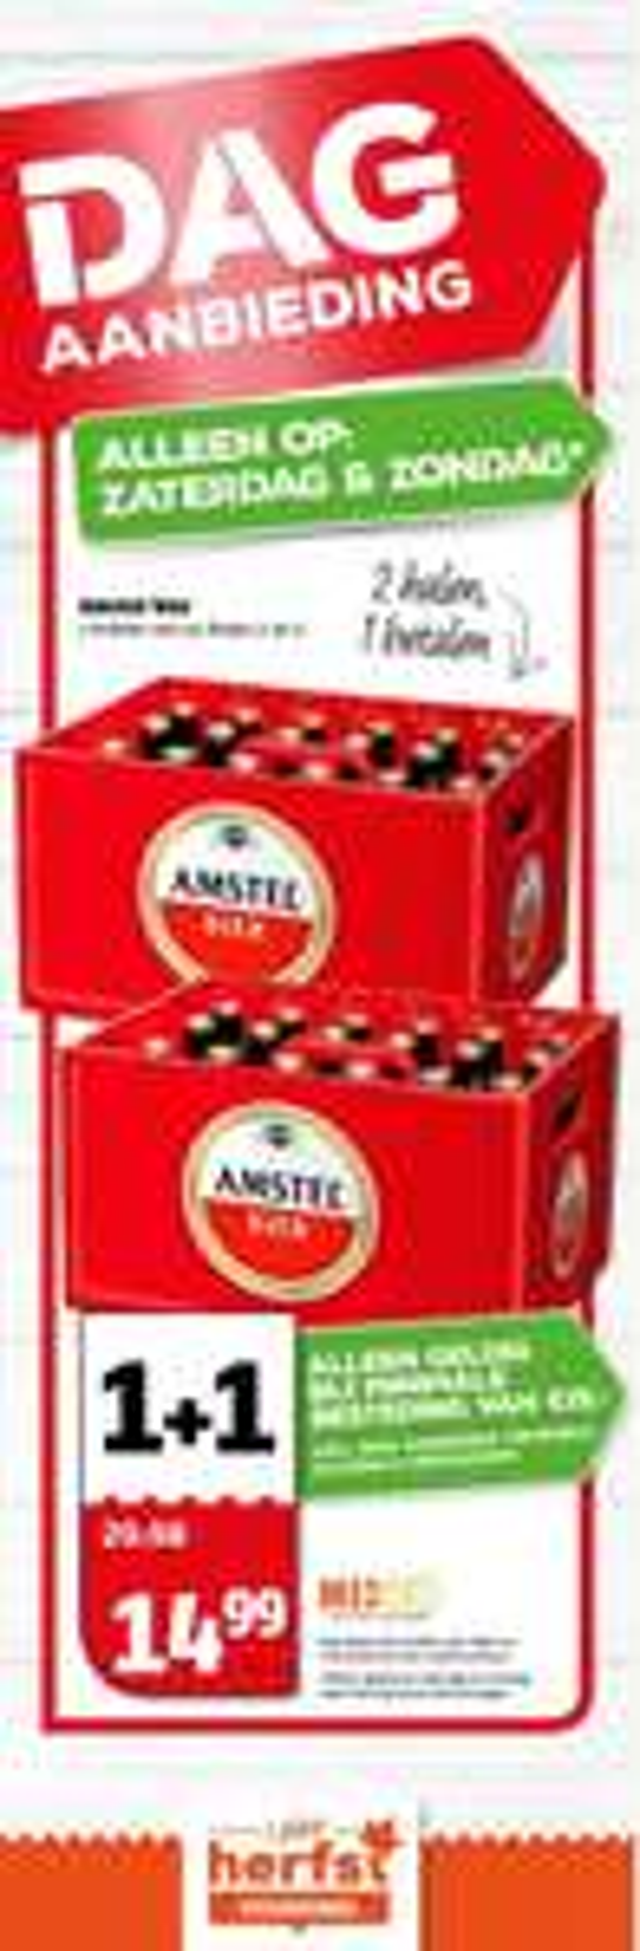 Amstelbier krat 1+1 gratis